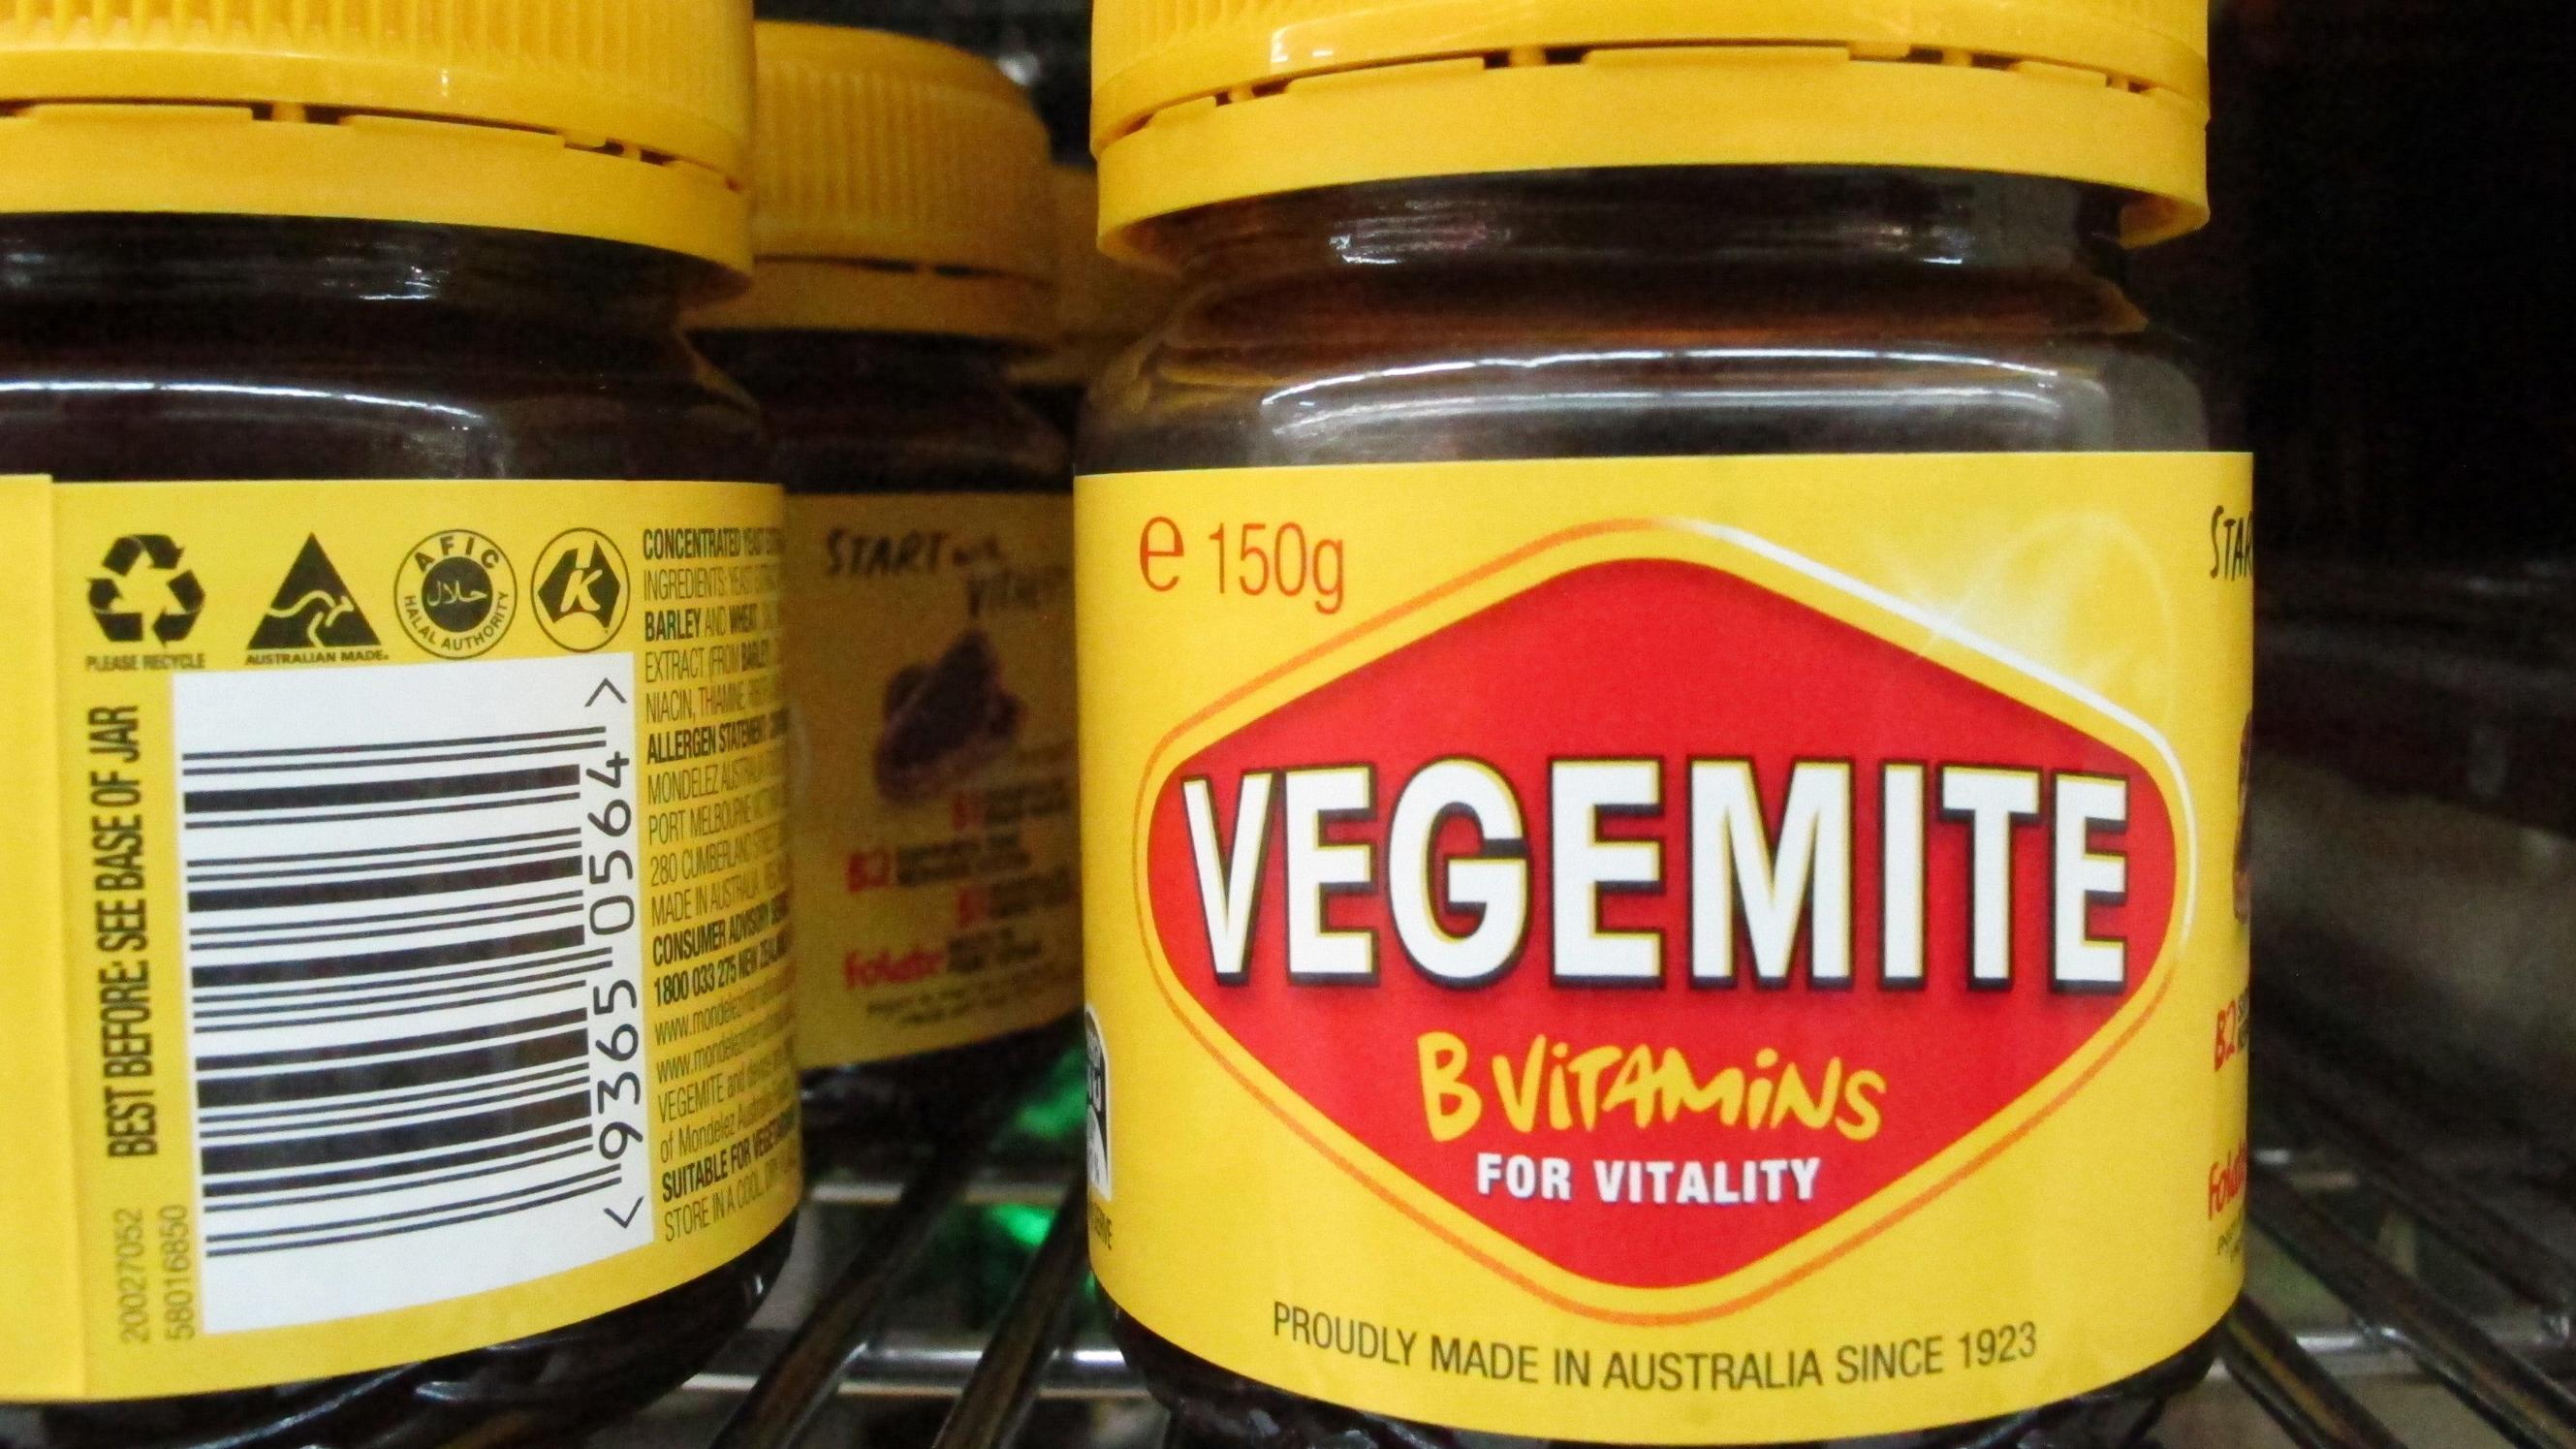 Ransomware stops Vegemite from becoming Australian again